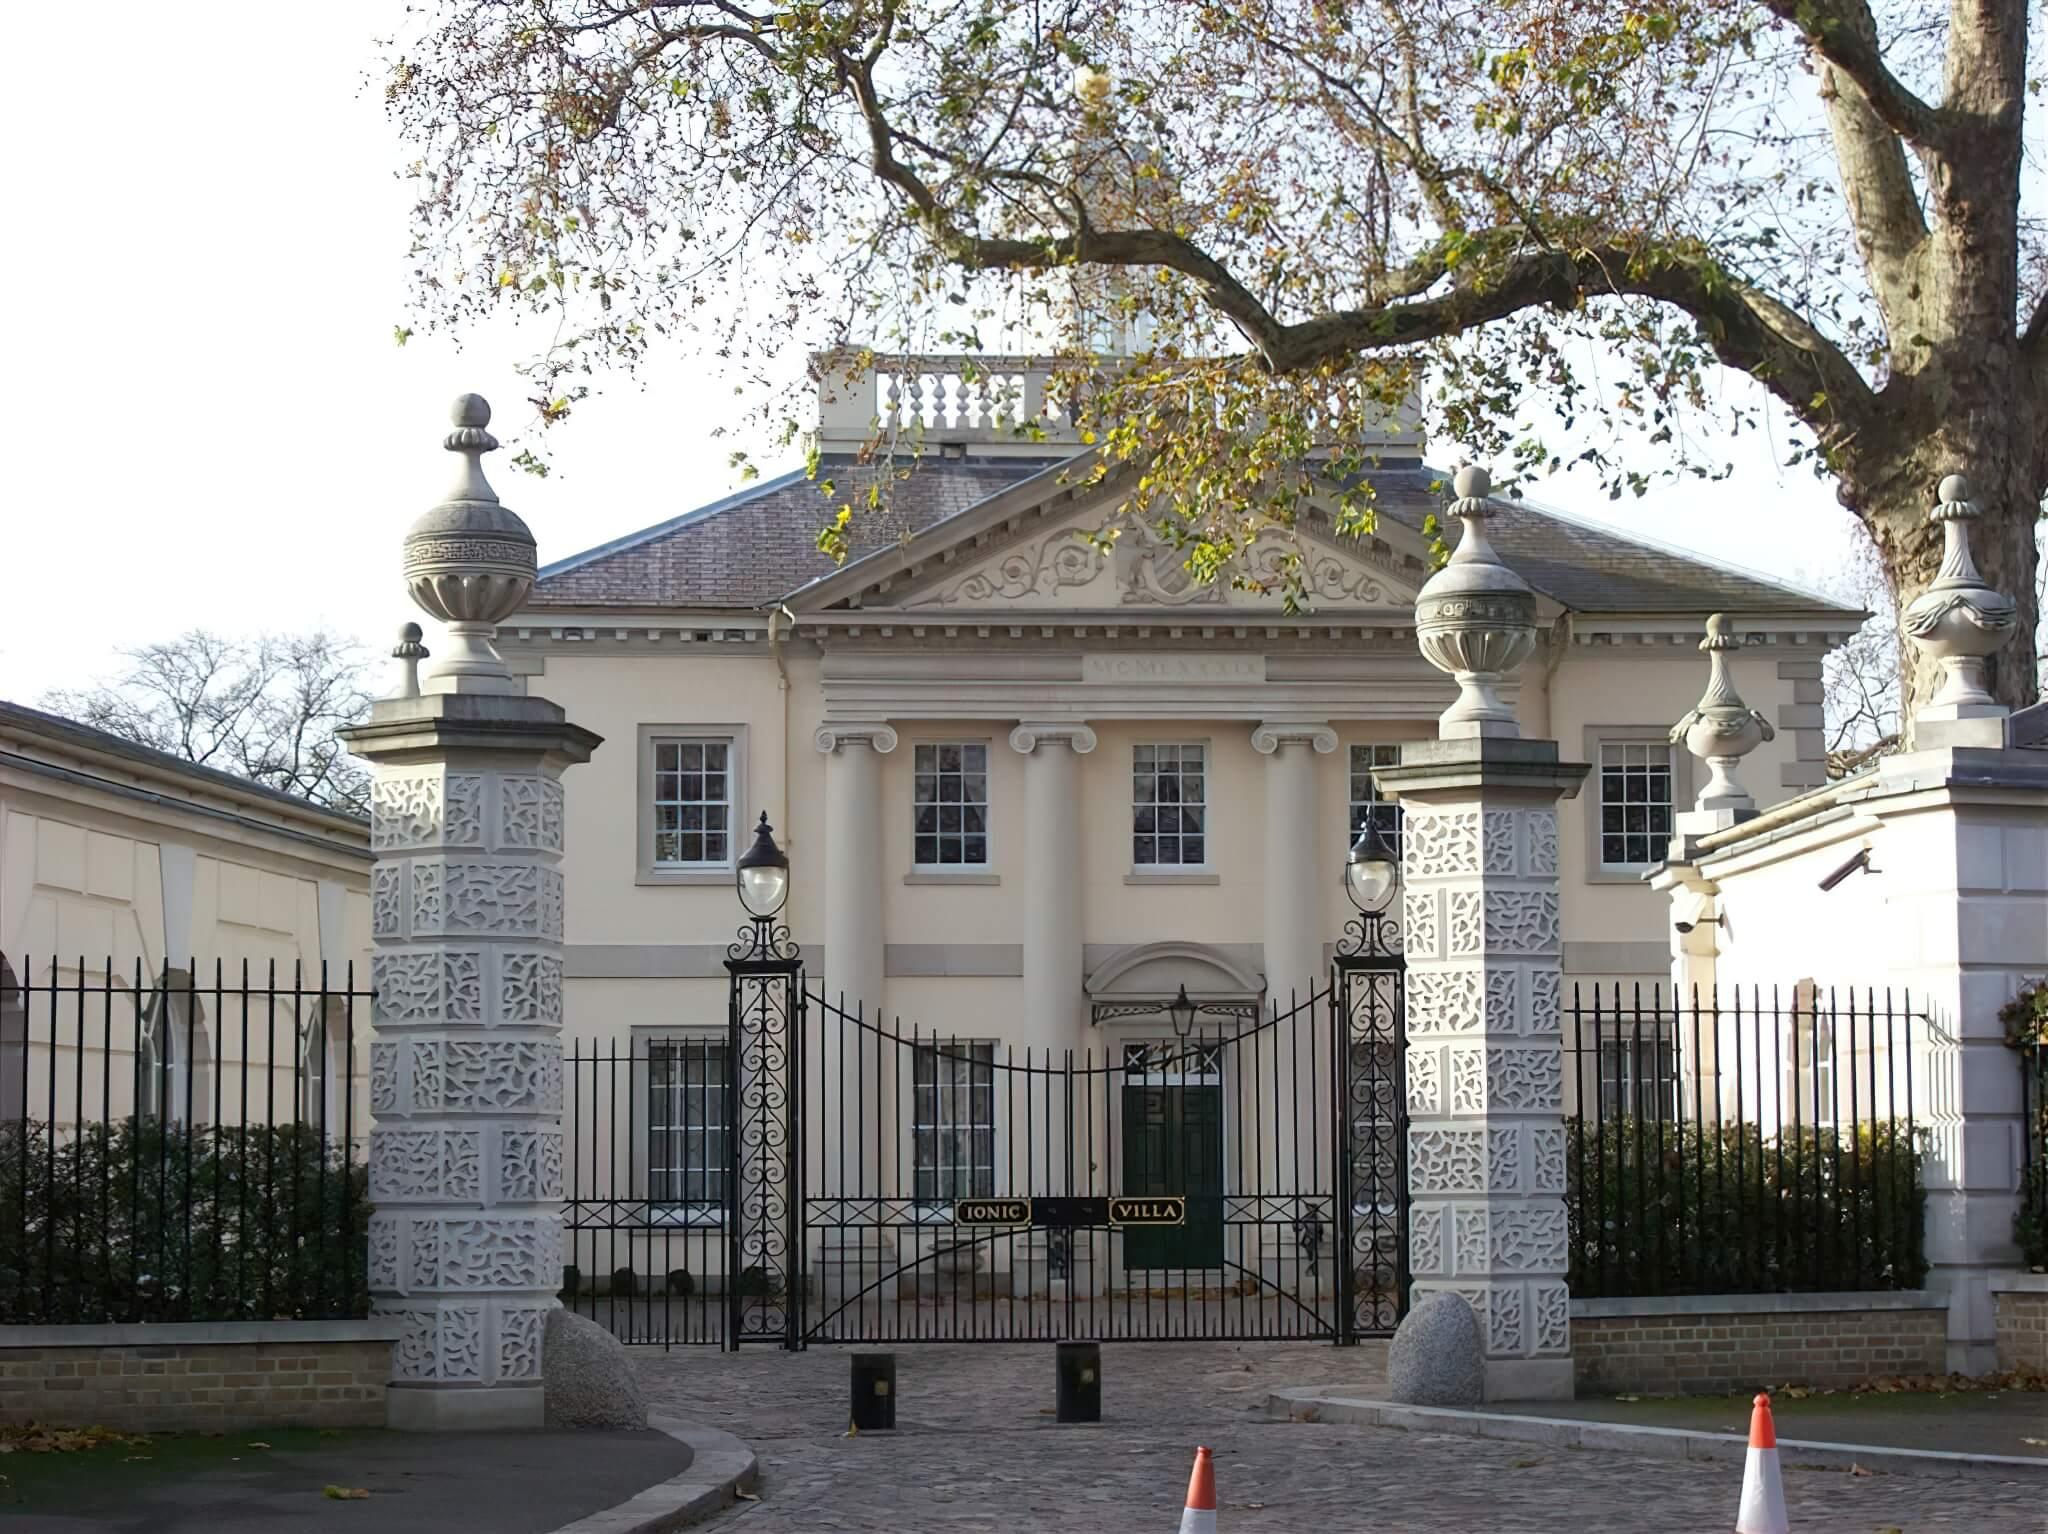 Ionic Villa Craigie Stockwell